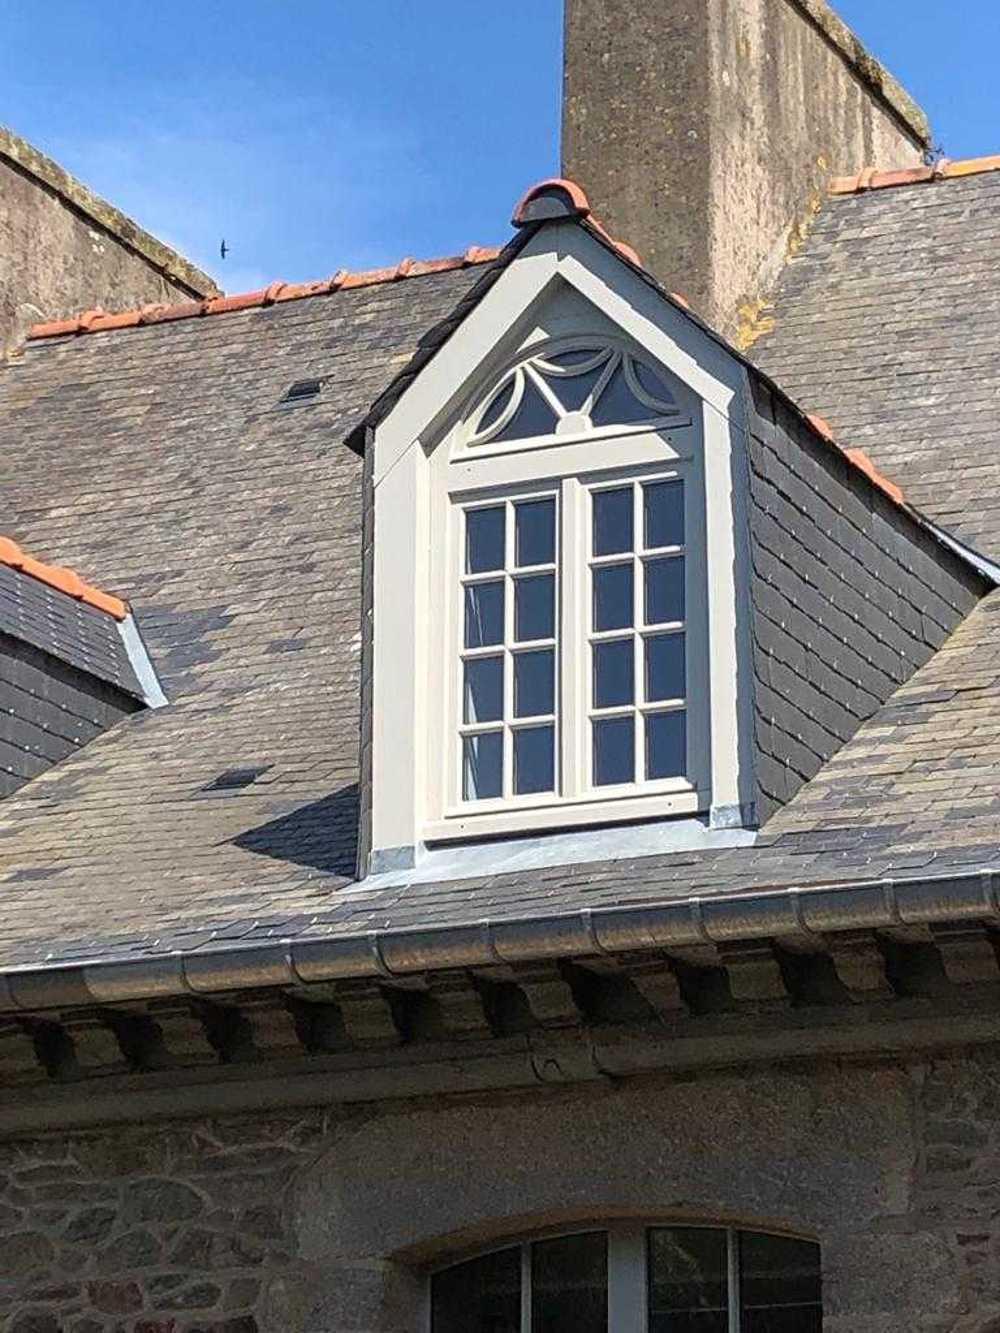 Installation de fenêtres en bois - Dinan (22) whatsappimage2020-07-08at01.51.57